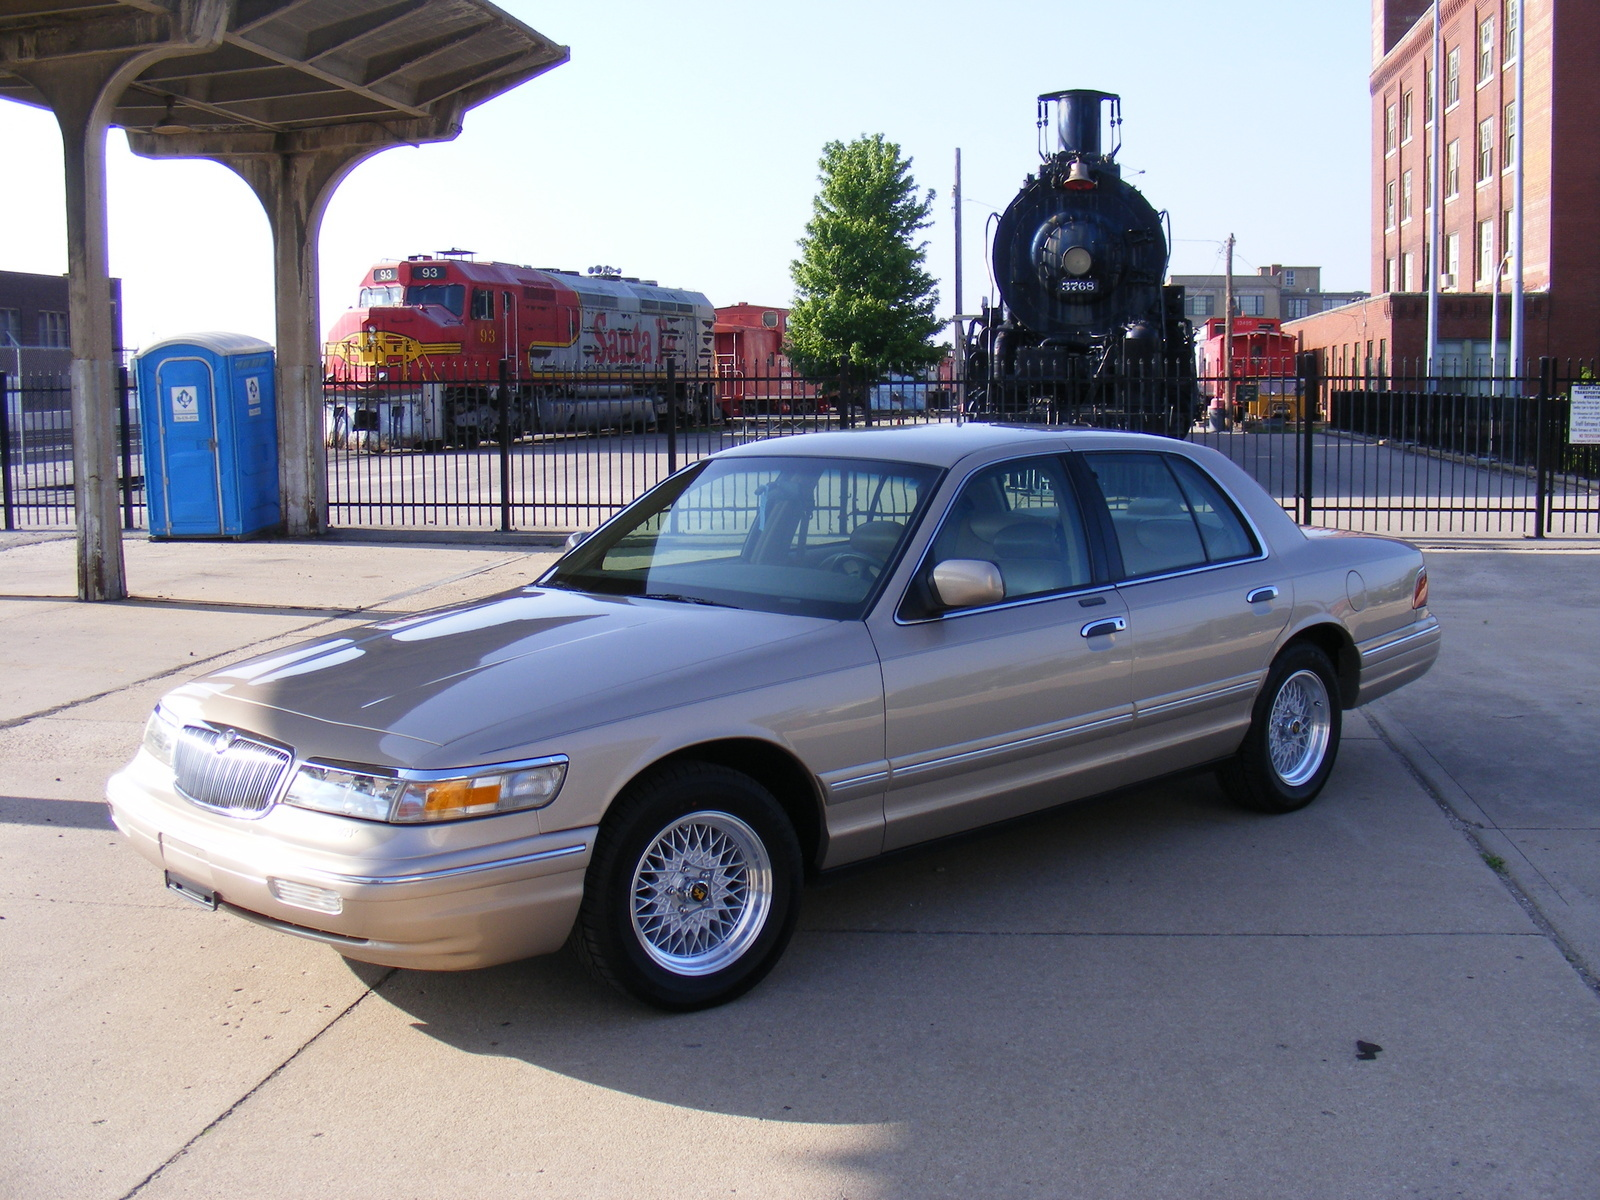 1997 Ford Crown Victoria  User Reviews  CarGurus